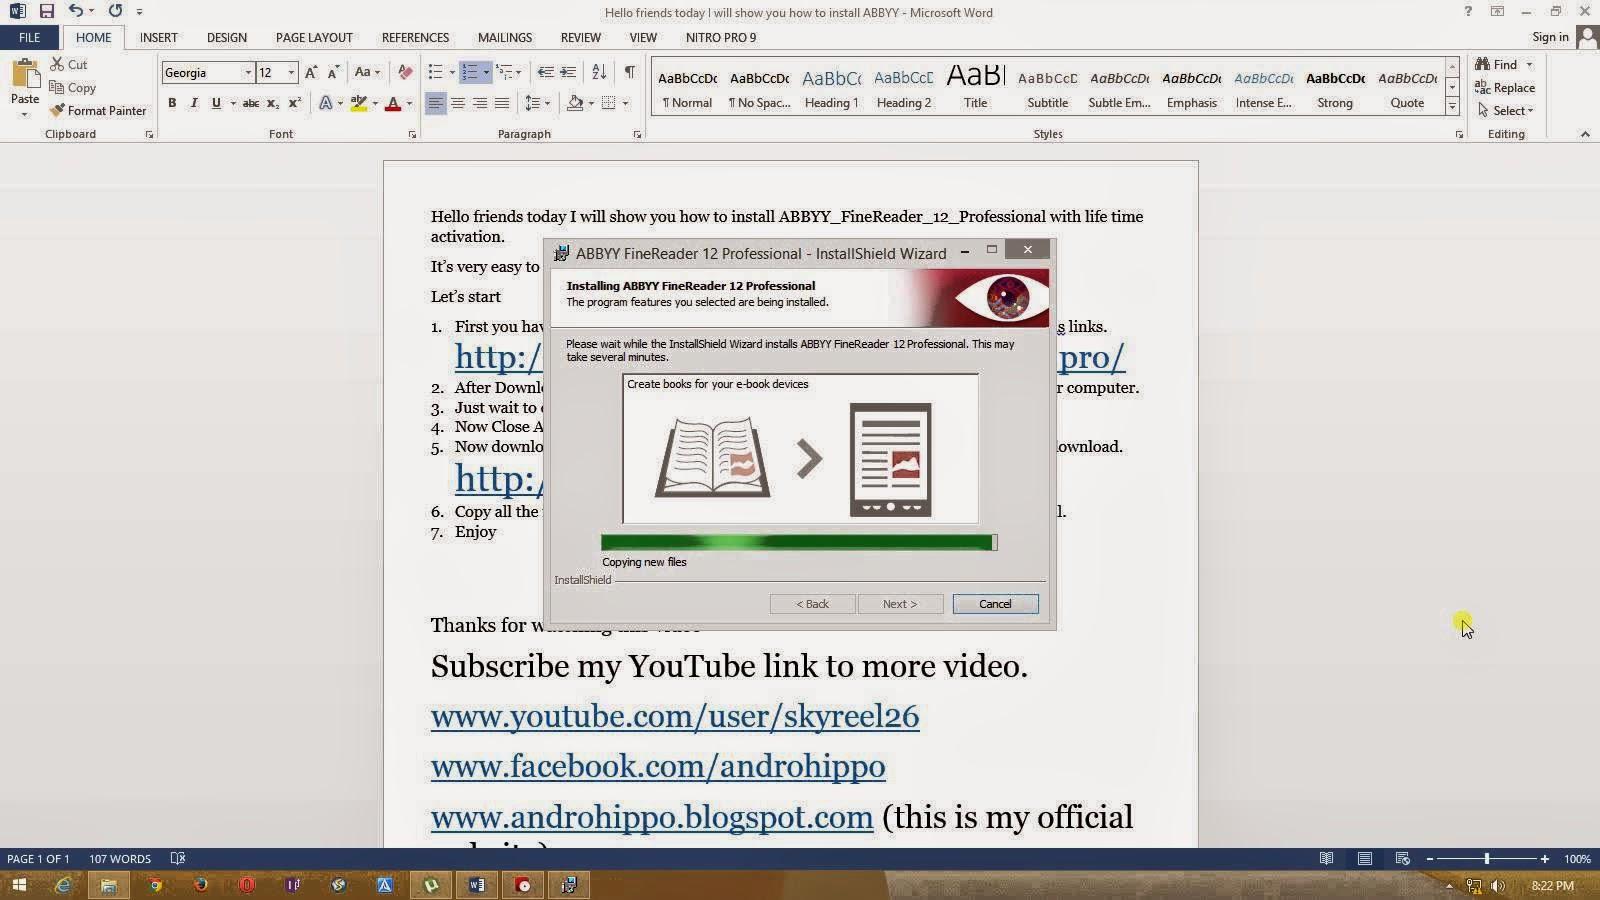 ABBYY FineReader Pro 12 screenshot